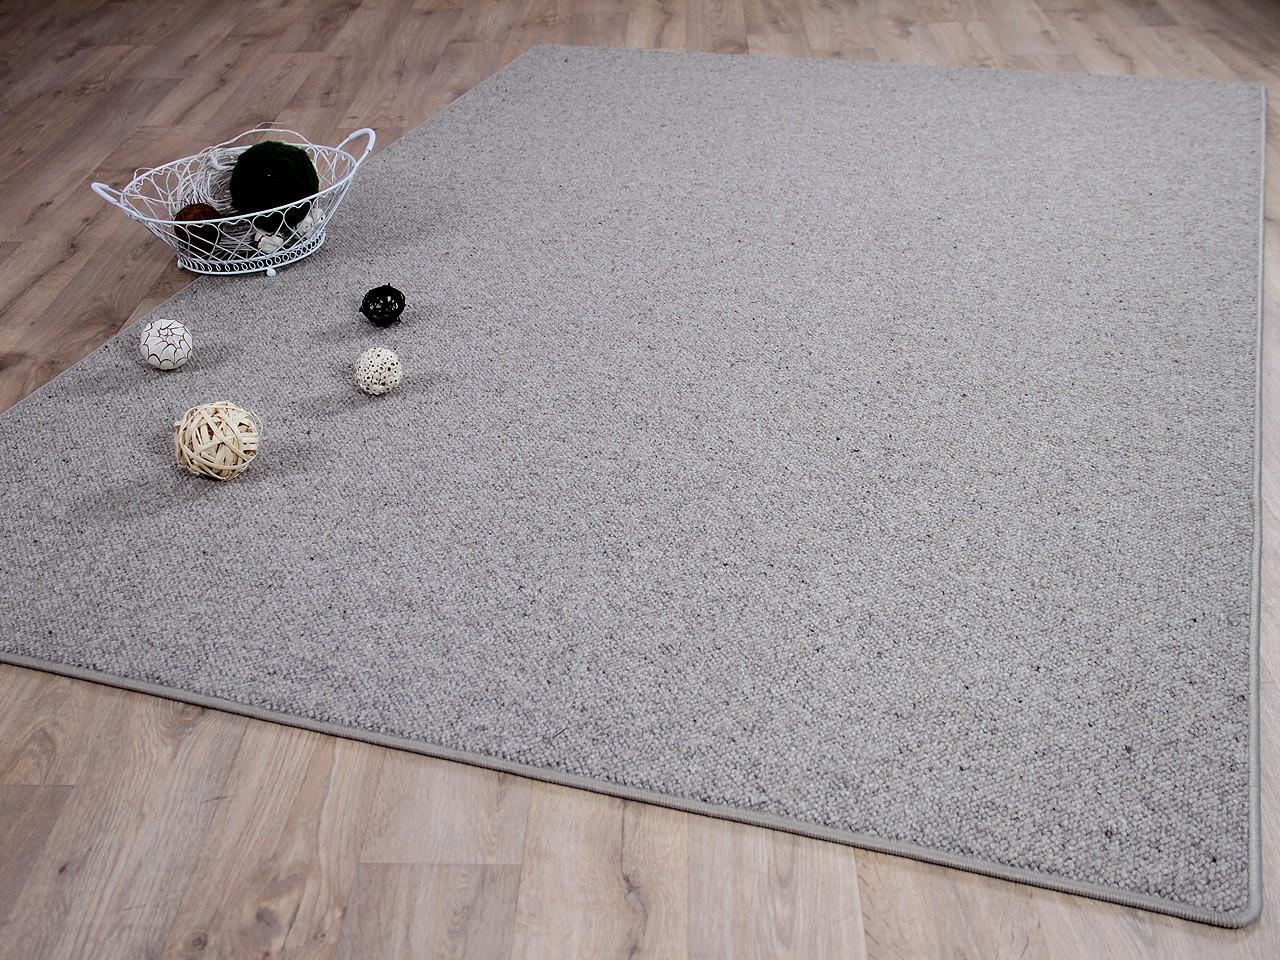 natur teppich wolle berber grau meliert in 24 gr en ebay. Black Bedroom Furniture Sets. Home Design Ideas